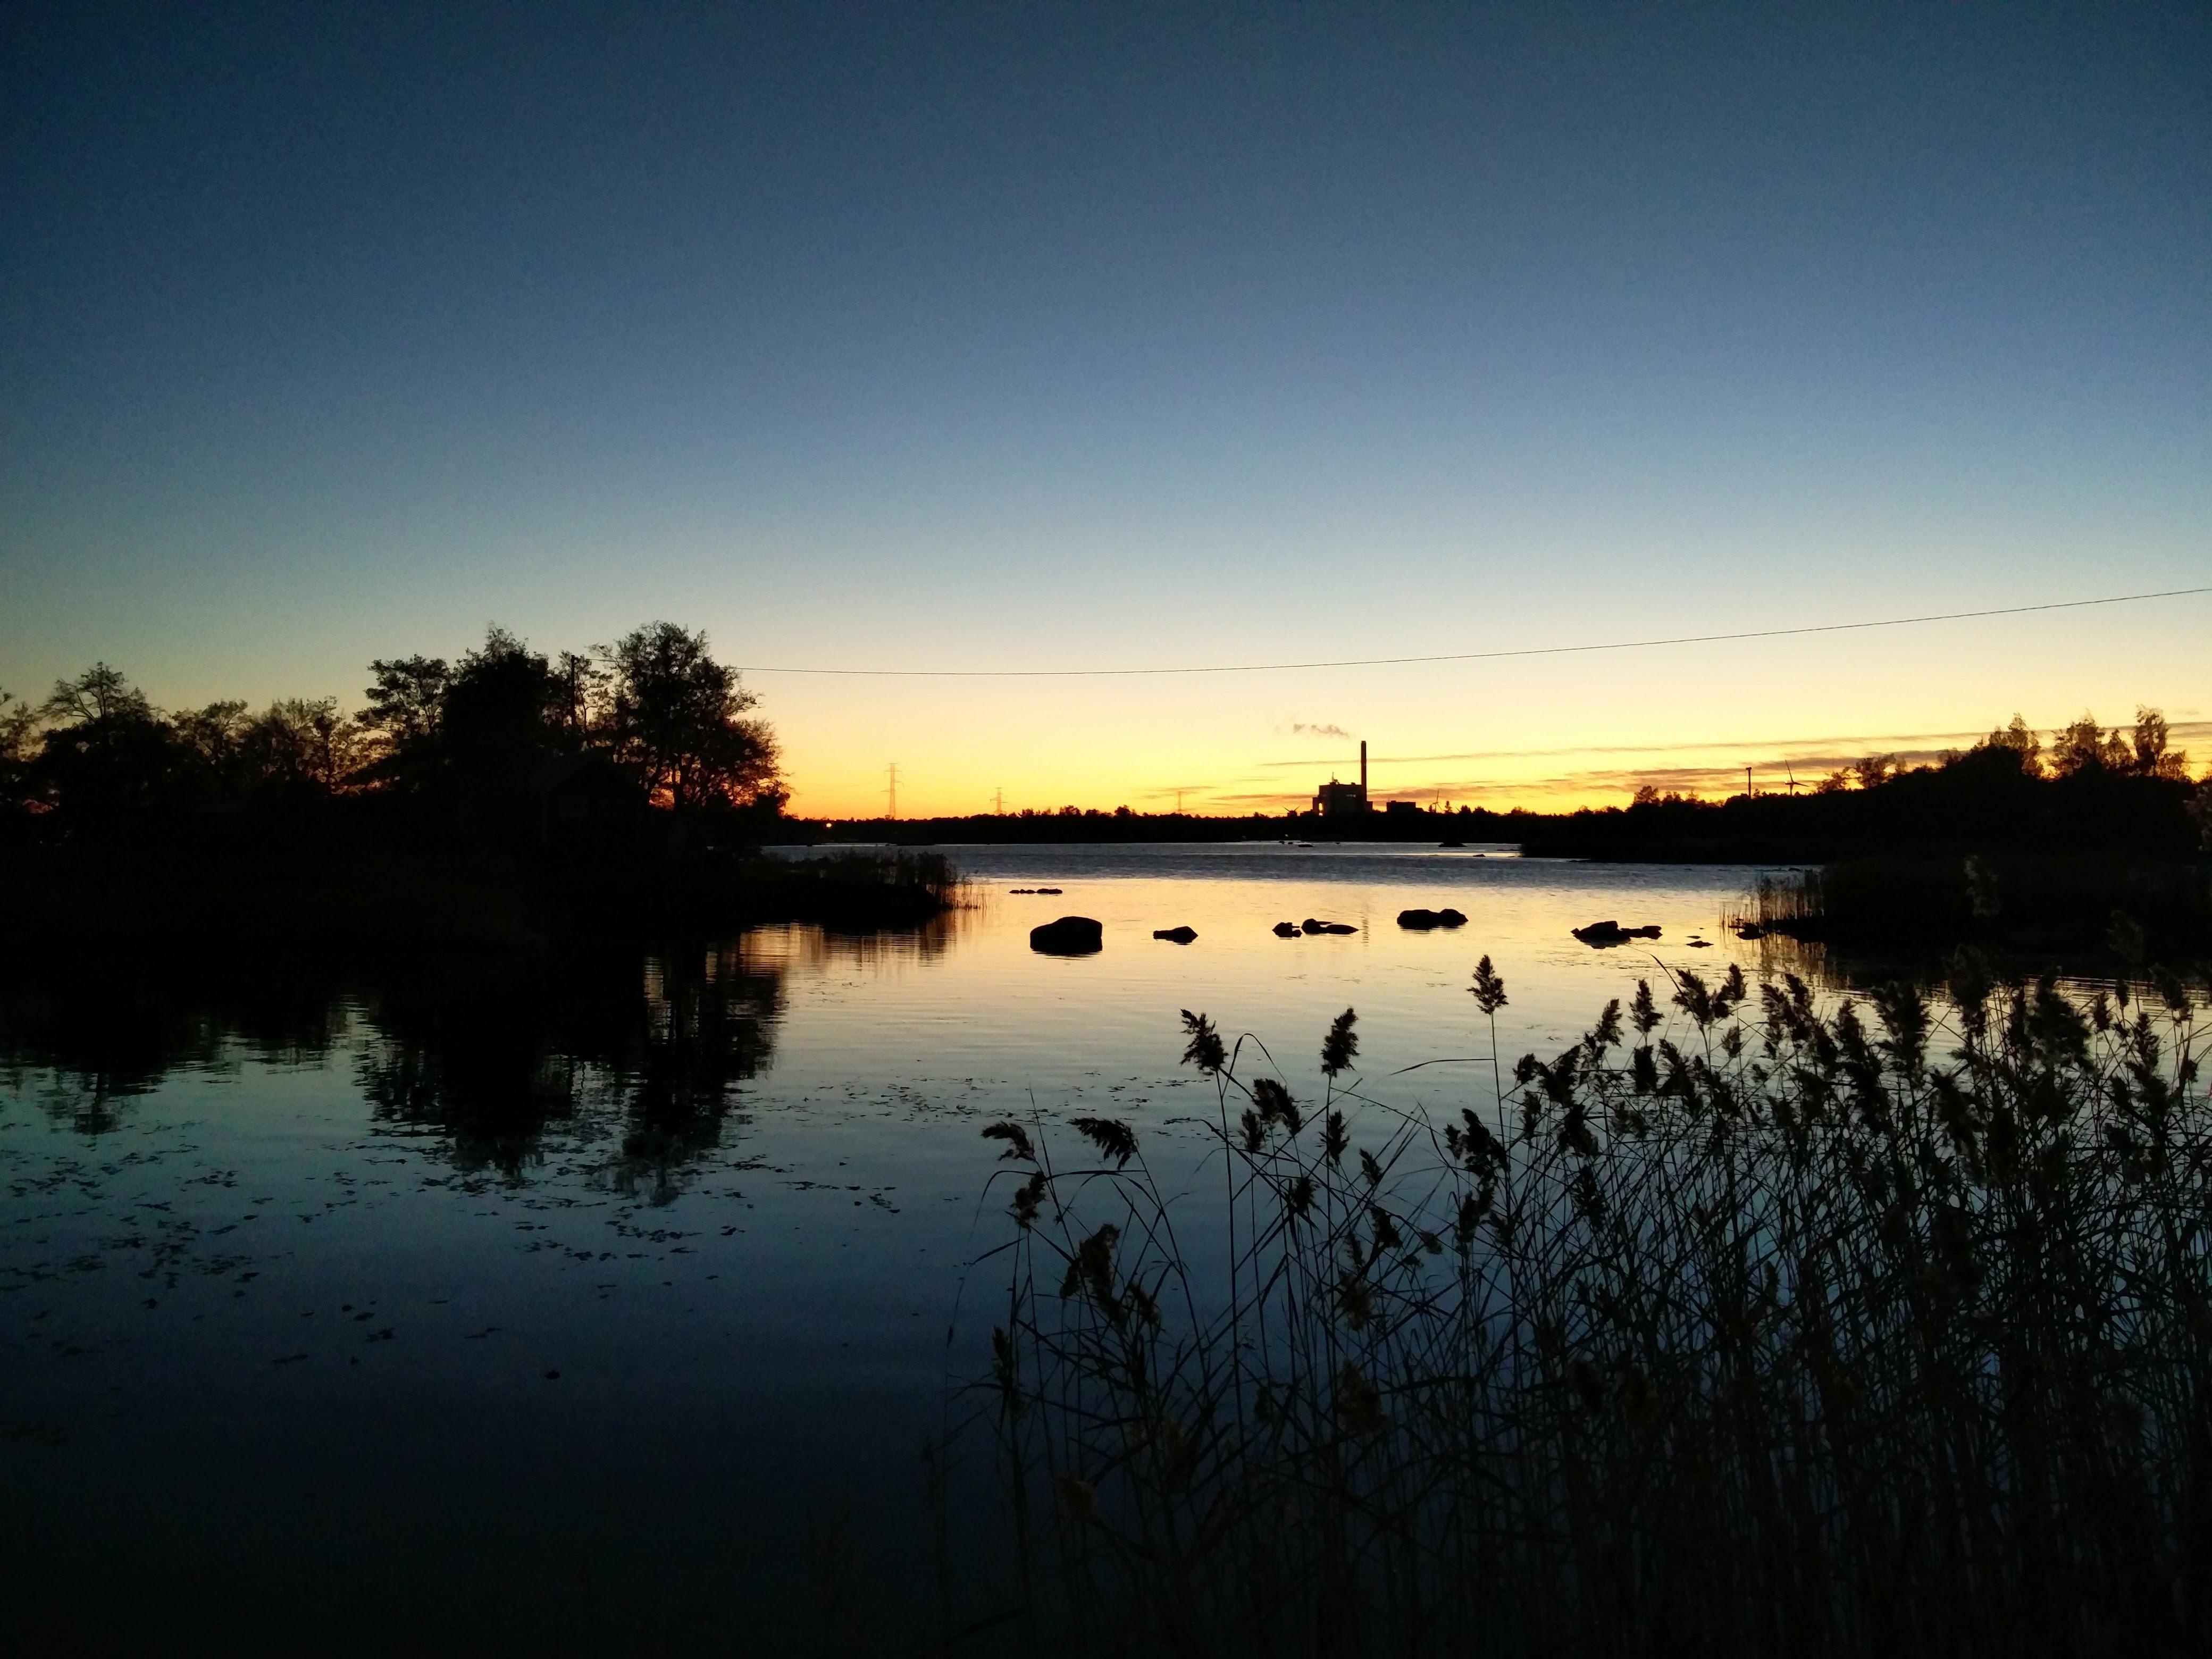 meri-pori_mokki_summer_cottage_finland_1